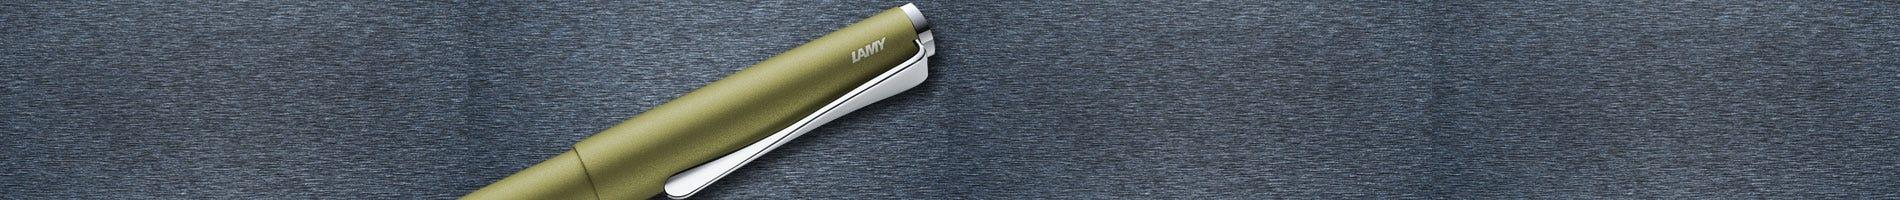 lamy studio olive special edition fountain pen